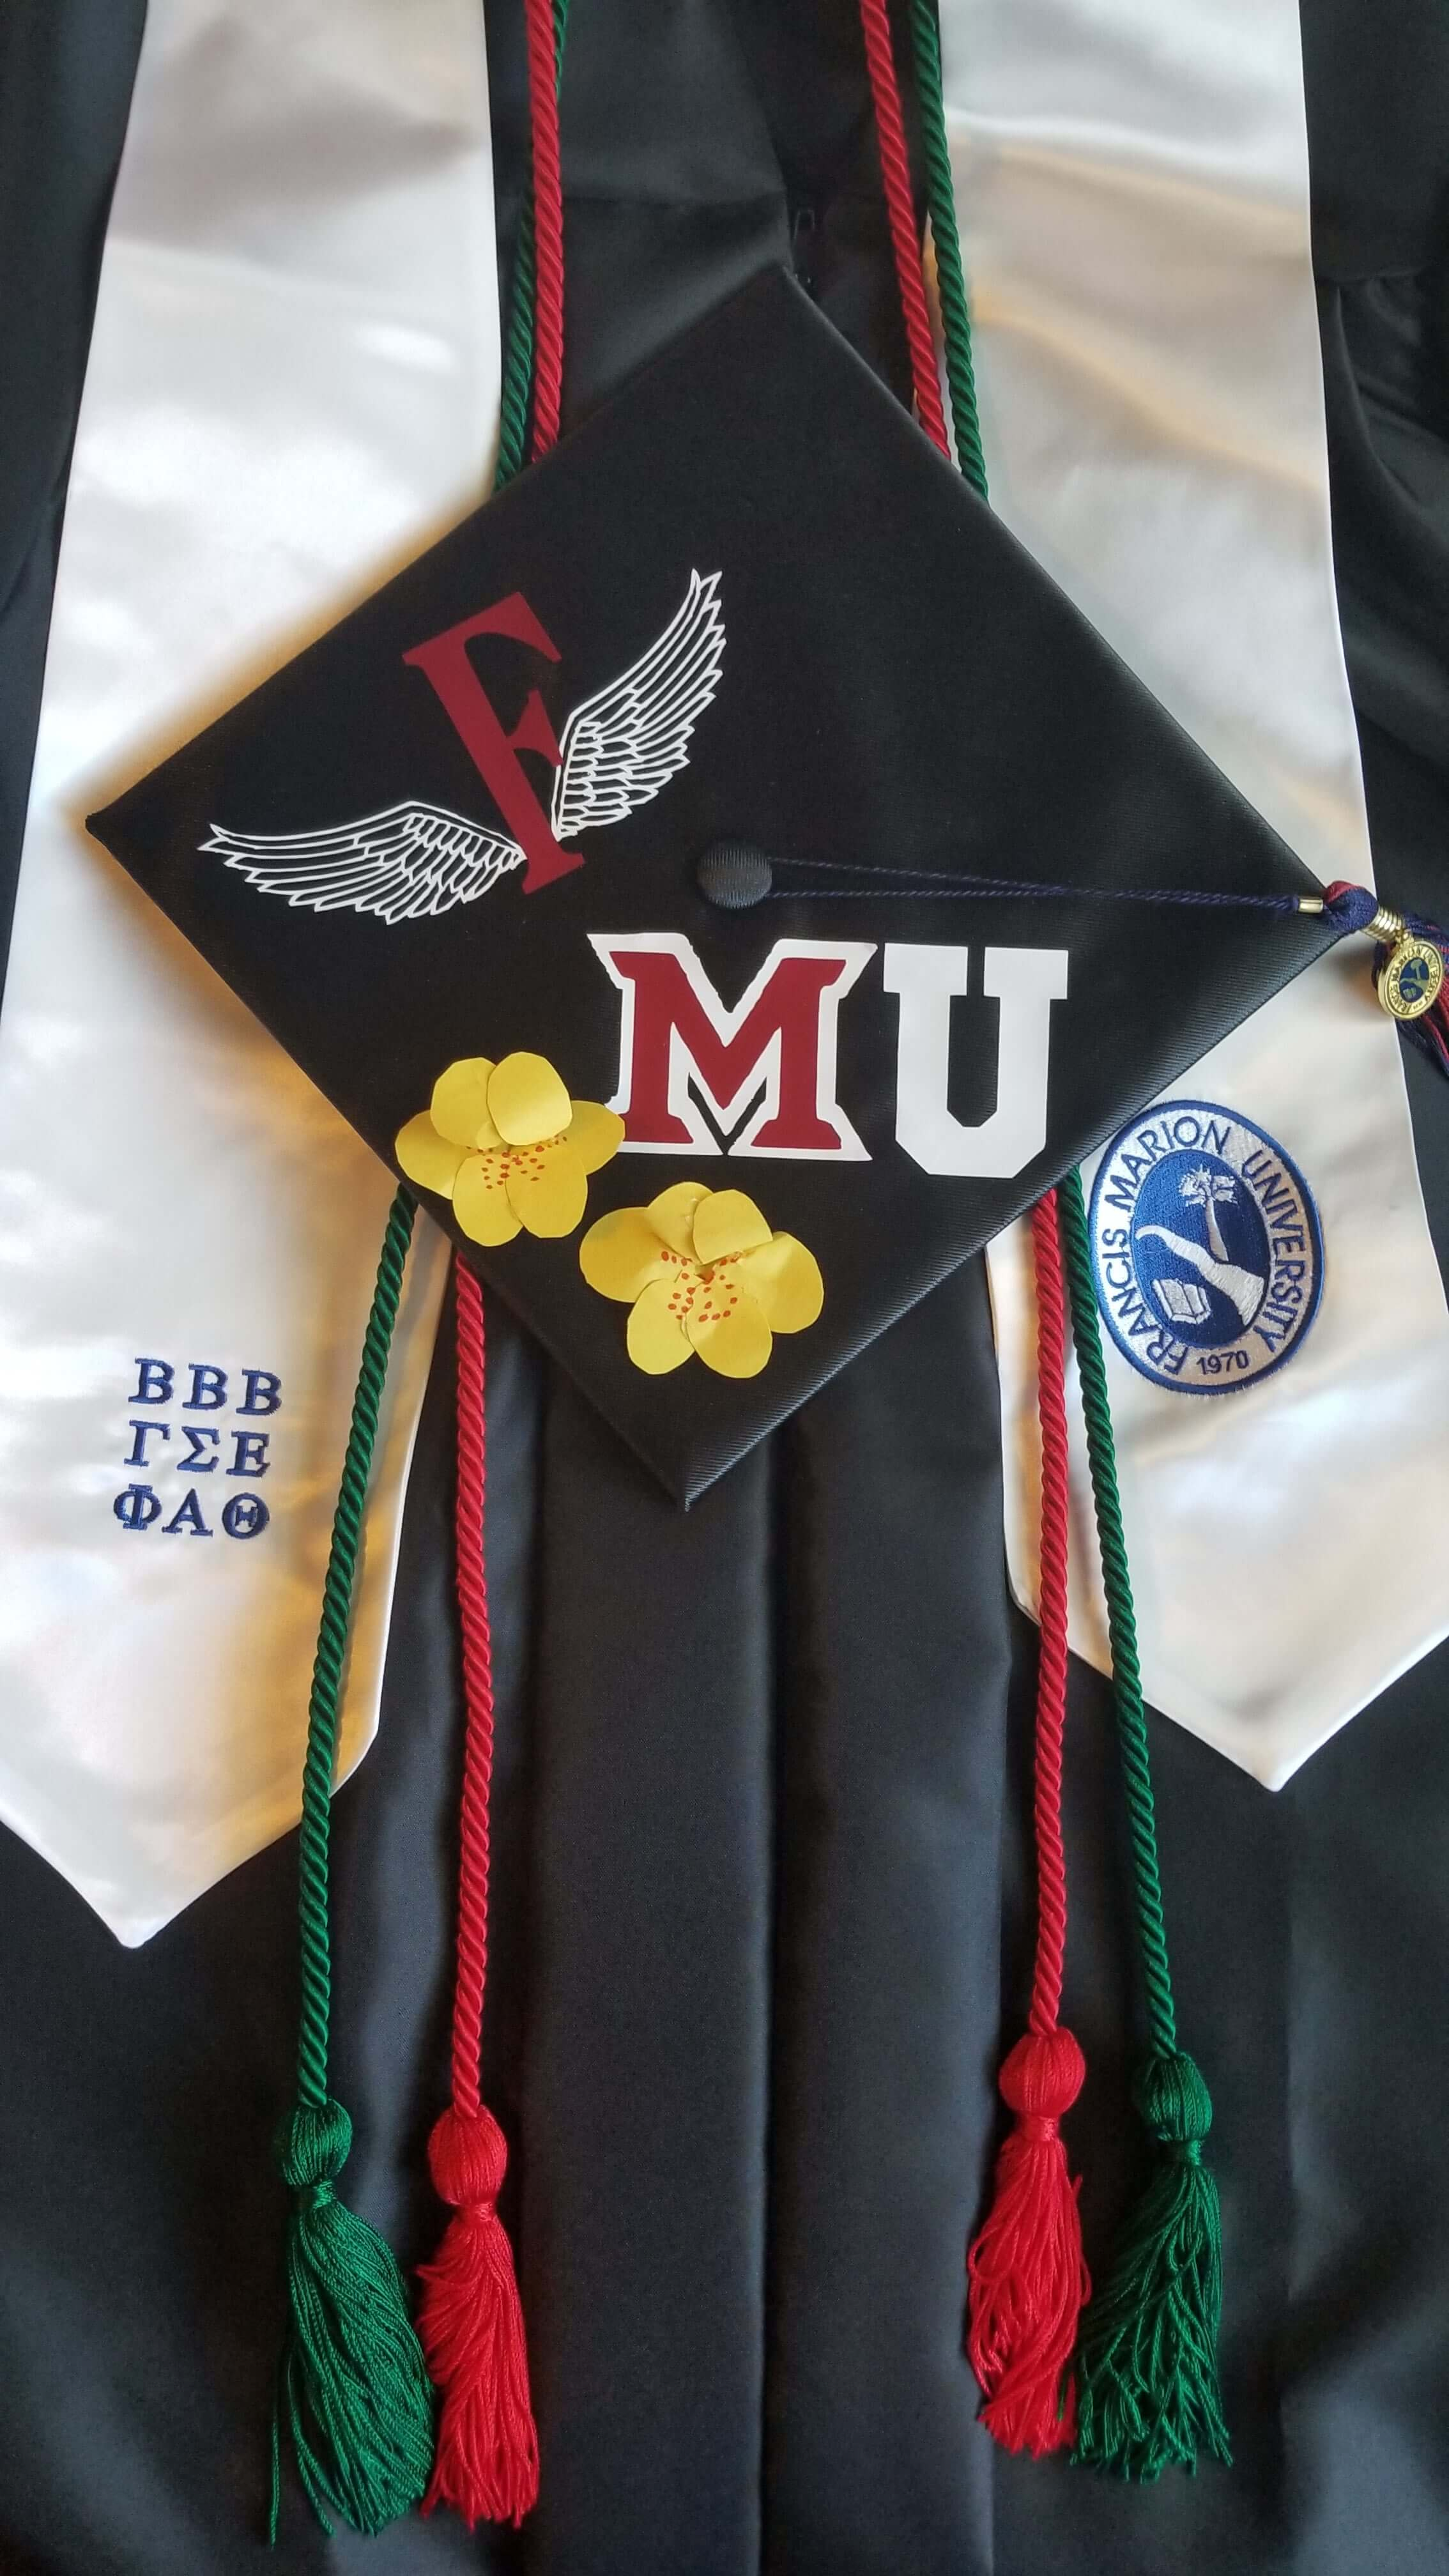 Deannah Neupert Personalized Graduation Cap and Regalia